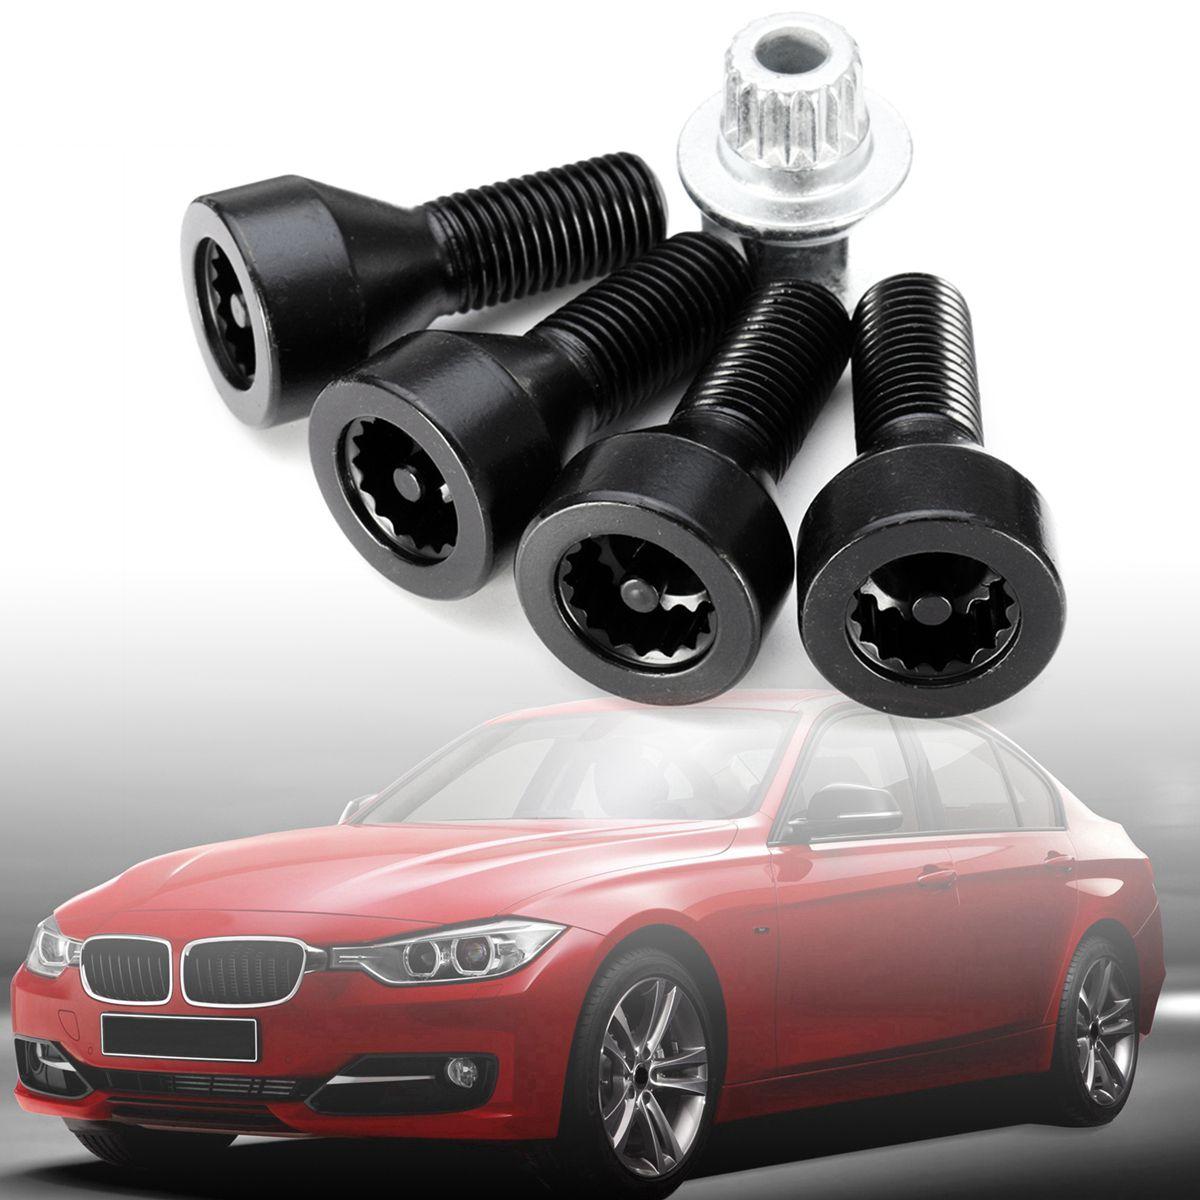 Wheel Lock Set Black Lug Bolts For BMW 128i 135i 318i 323i 325i 328i 330i 335i 525i 528i 530i 535i 540i 545i 550i 650i 735i 740i for bmw 5 series e60 m5 e61 car front headlamp housing clear lens shell cover for bmw 525i 530i 528i 535i 540i 550i 545i n001